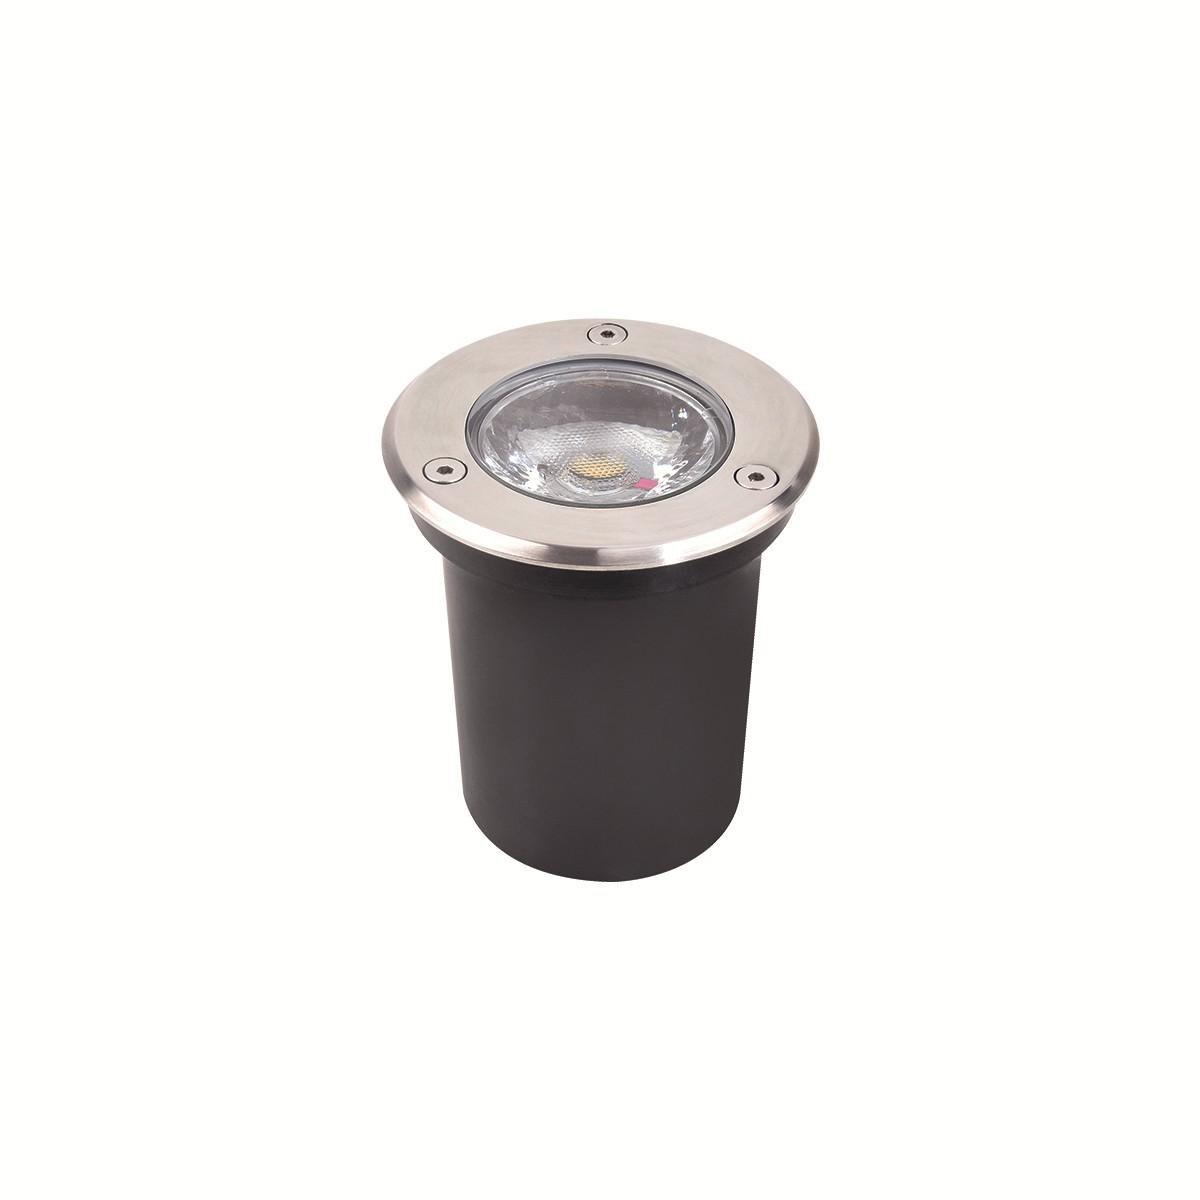 Luminaria de Embutir Balizador LED 3W Luz Branca Bivolt - Luminatti